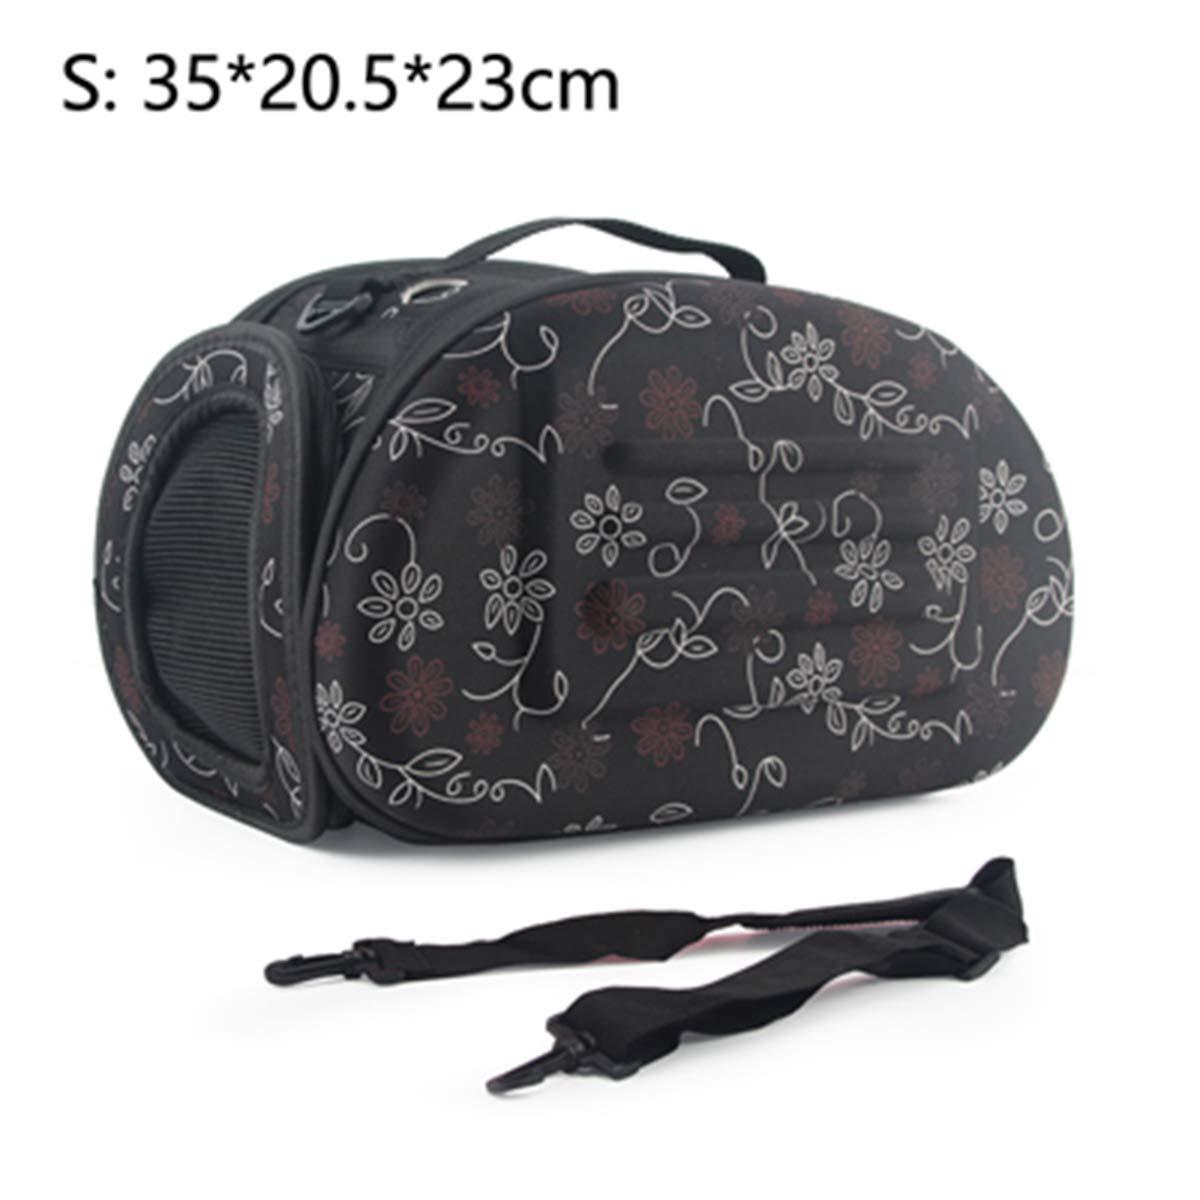 s 35x20.5x23cm print Come PicturePETFDH Dog Carrier Bag Portable Cats Handbag Foldegable Travel Bag Puppy Carring Mesh Shoulder Pet Bag s S /L Pink 45x32x38cm